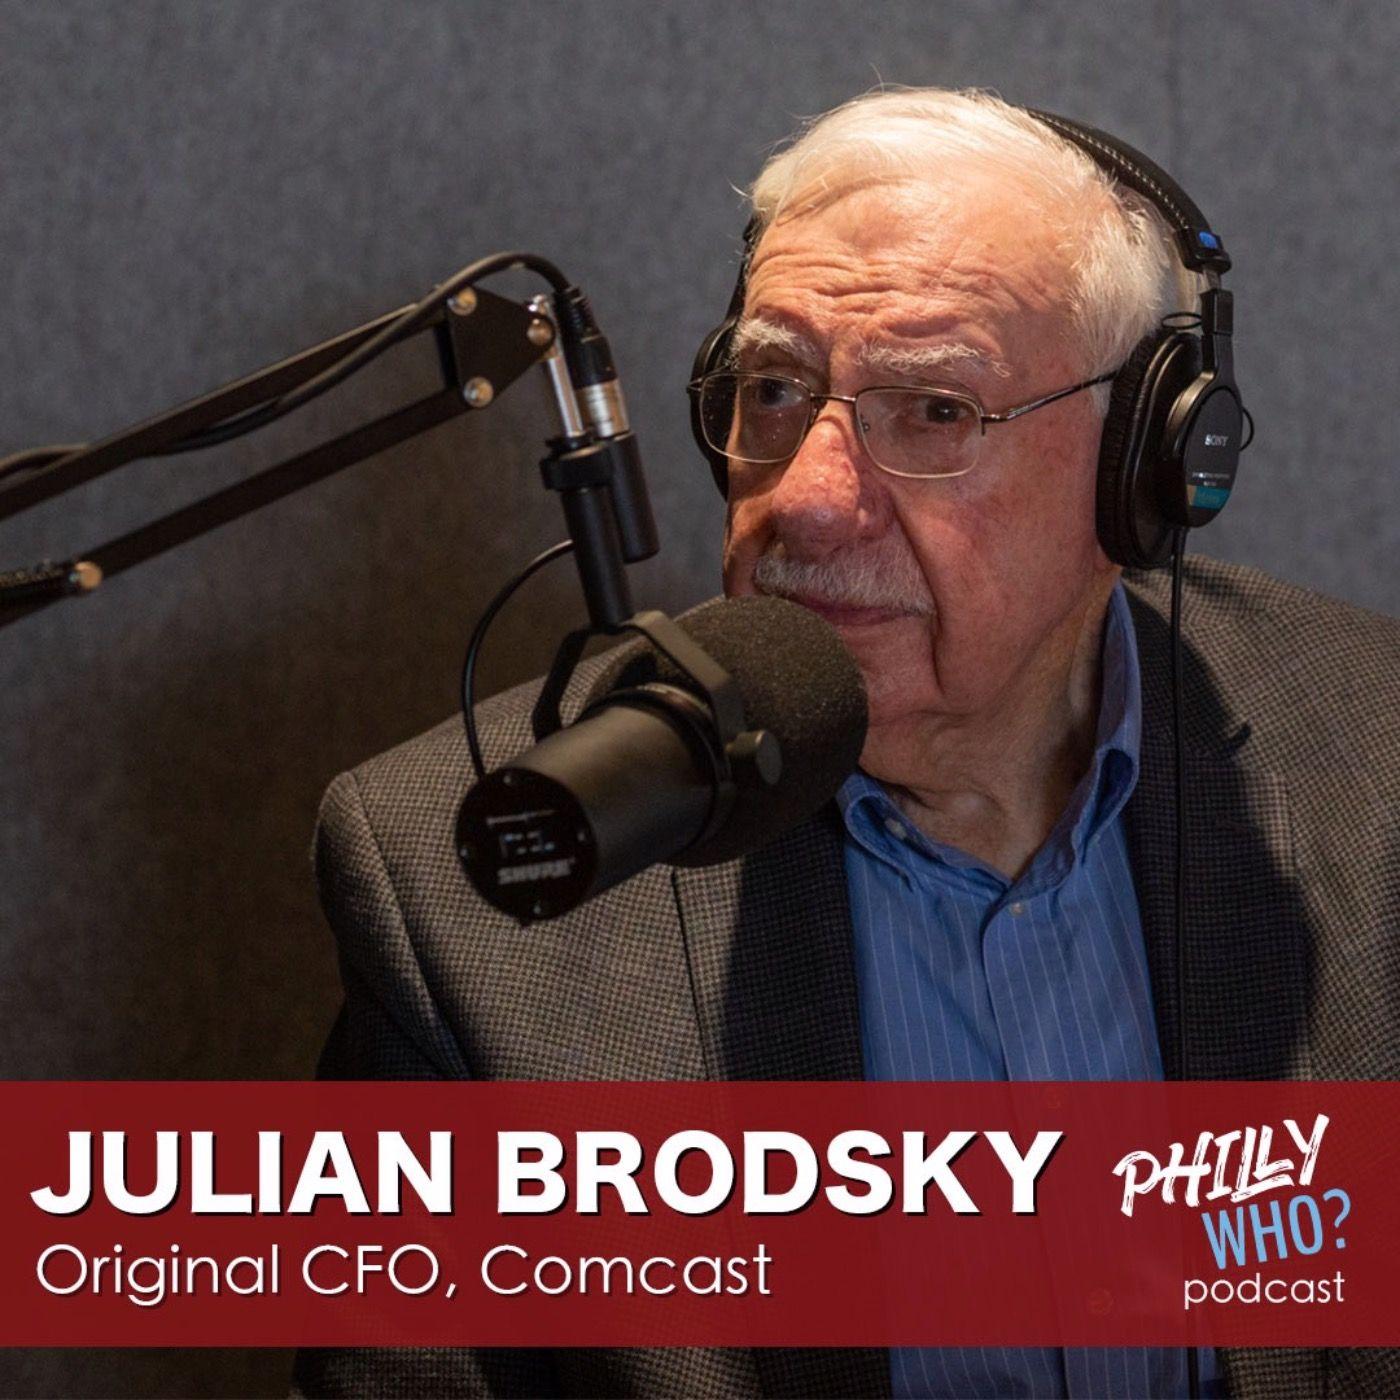 Julian Brodsky: The Creation of Comcast